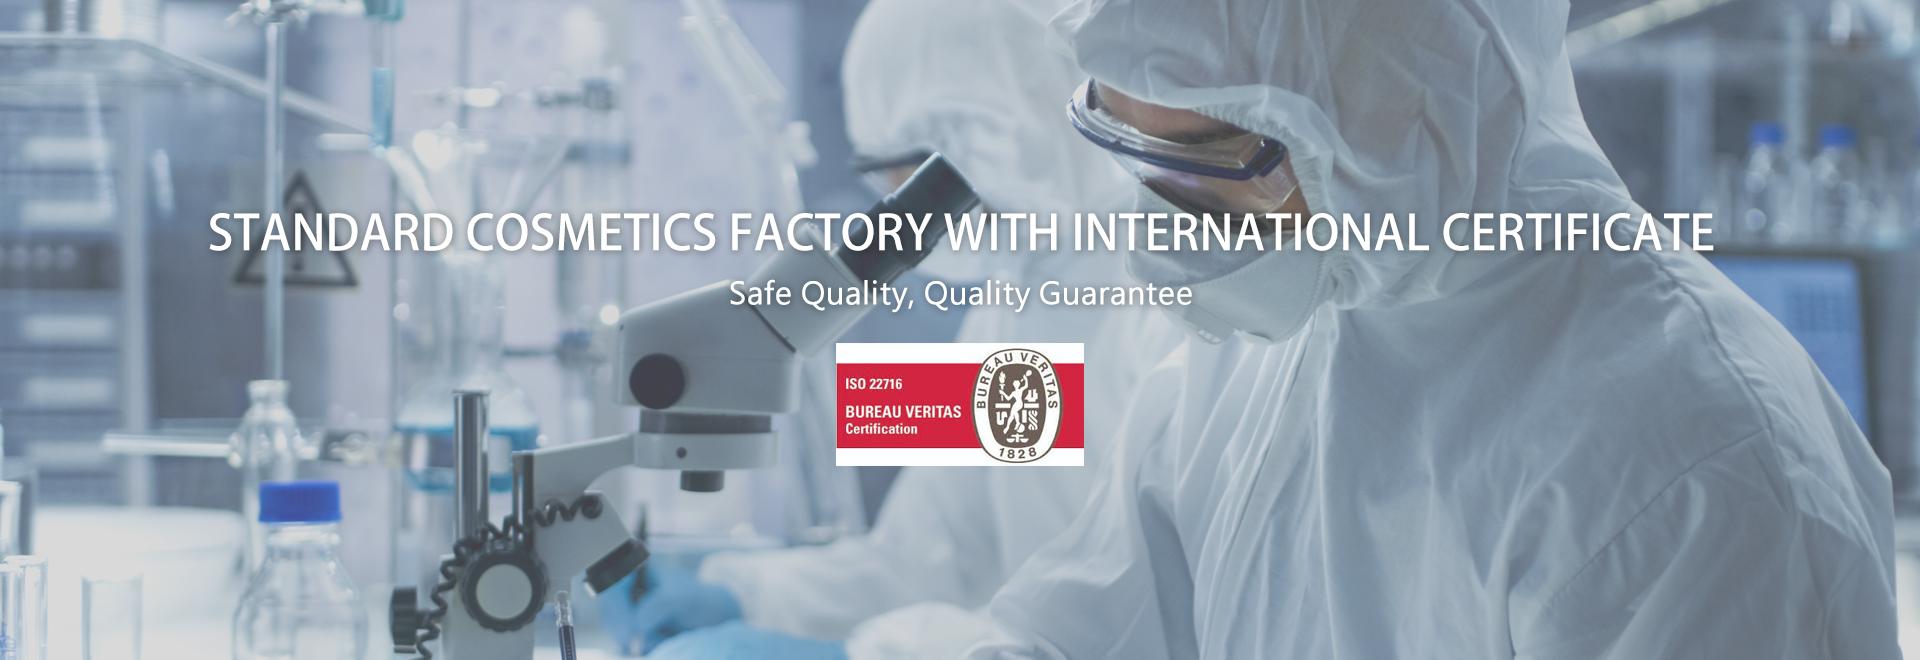 ISO22716 國際GMP